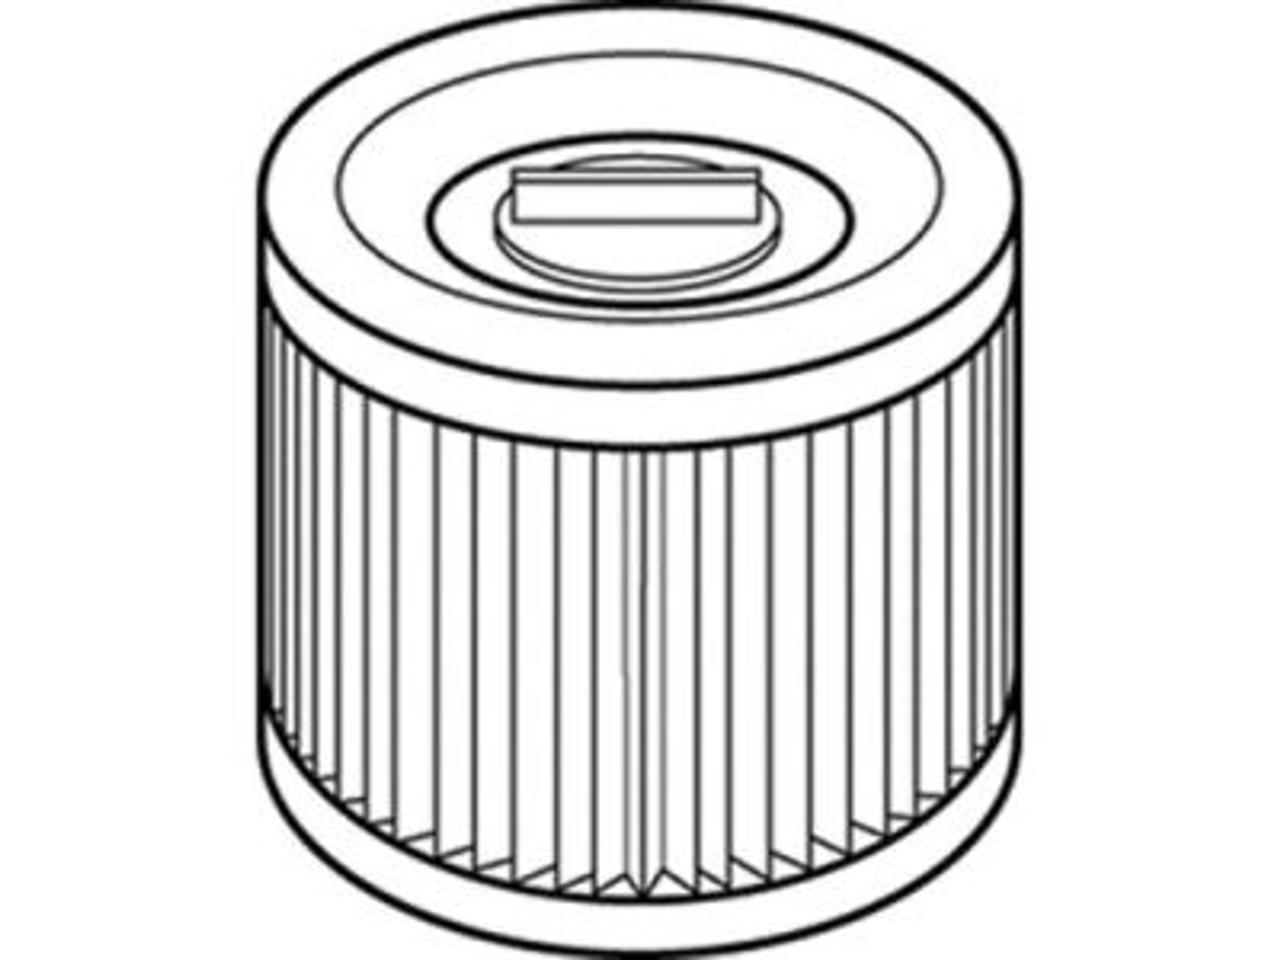 Goblin - Aquavac Late Cartridge Filter - FIL47